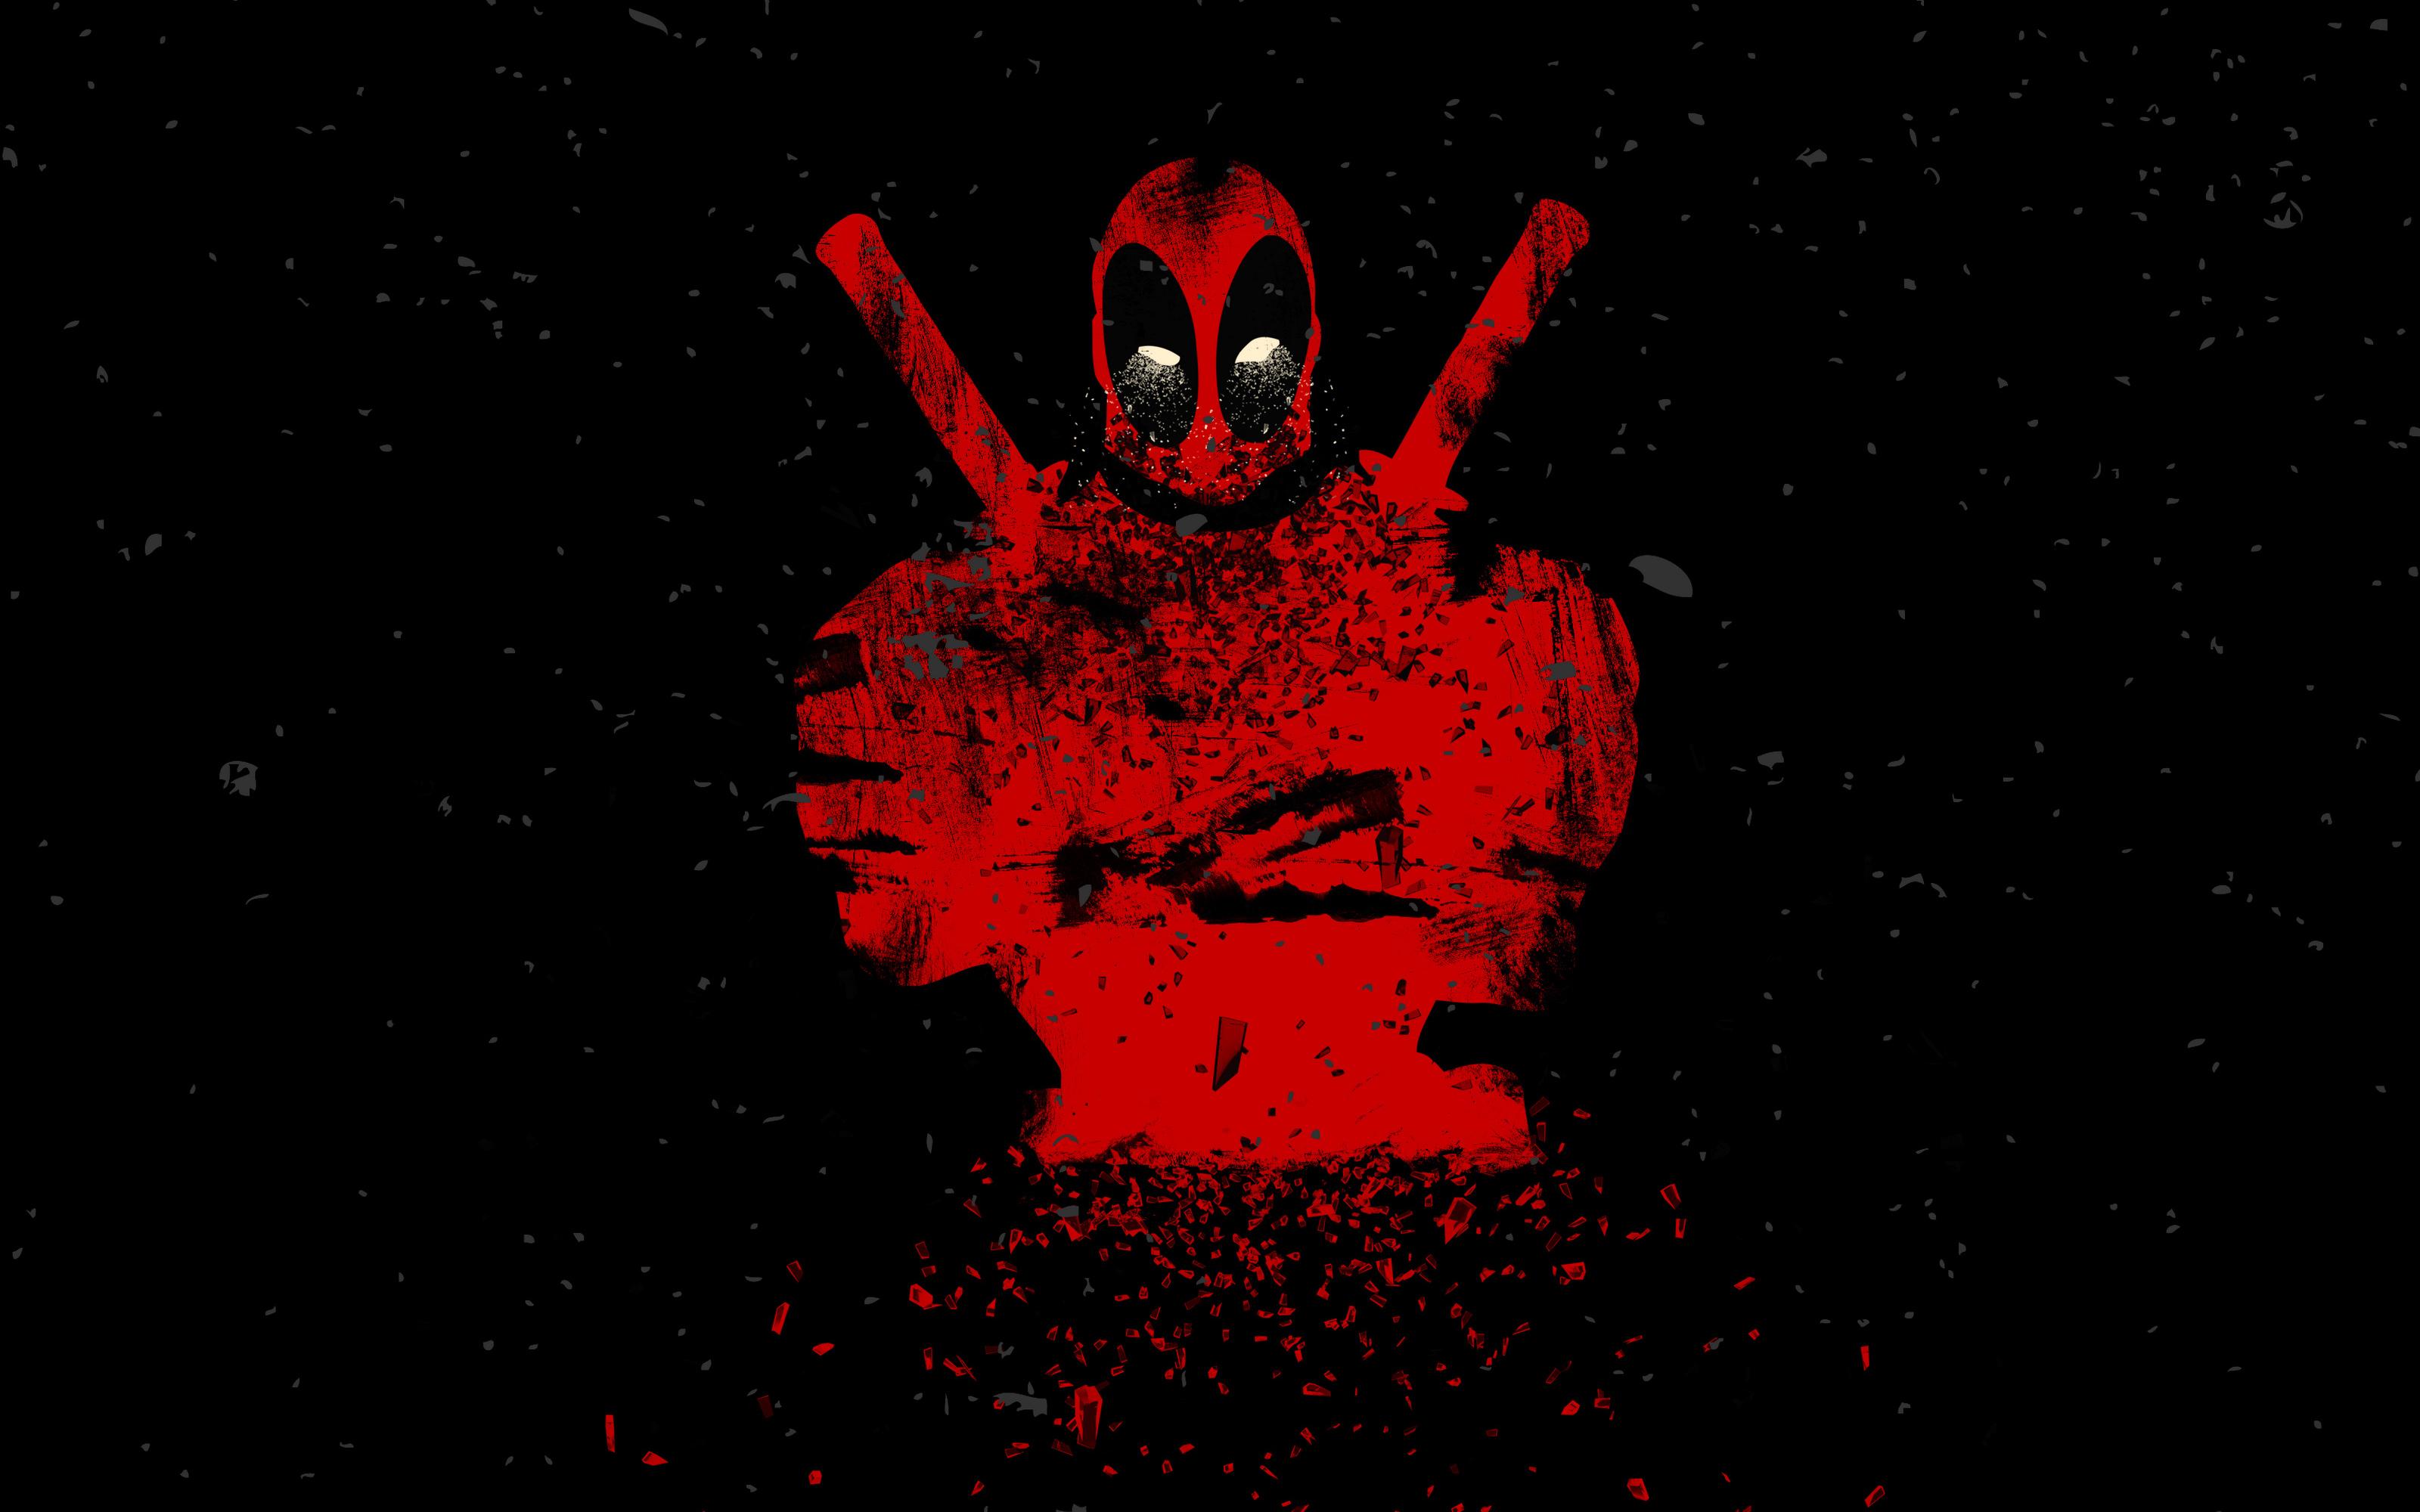 Wallpaper Deadpool Artwork Man